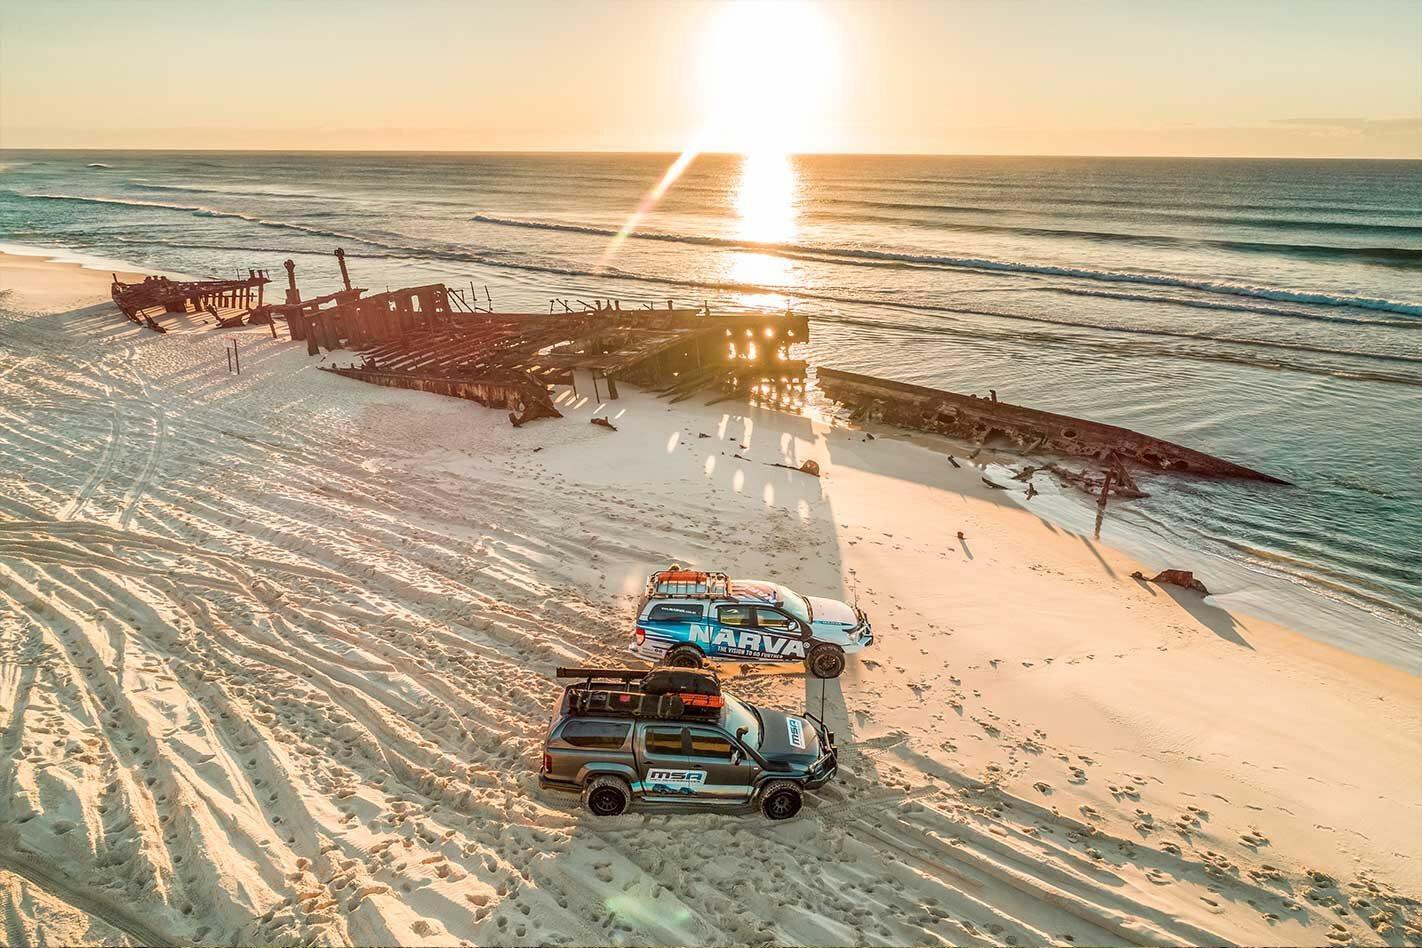 Best beach drives in Australia